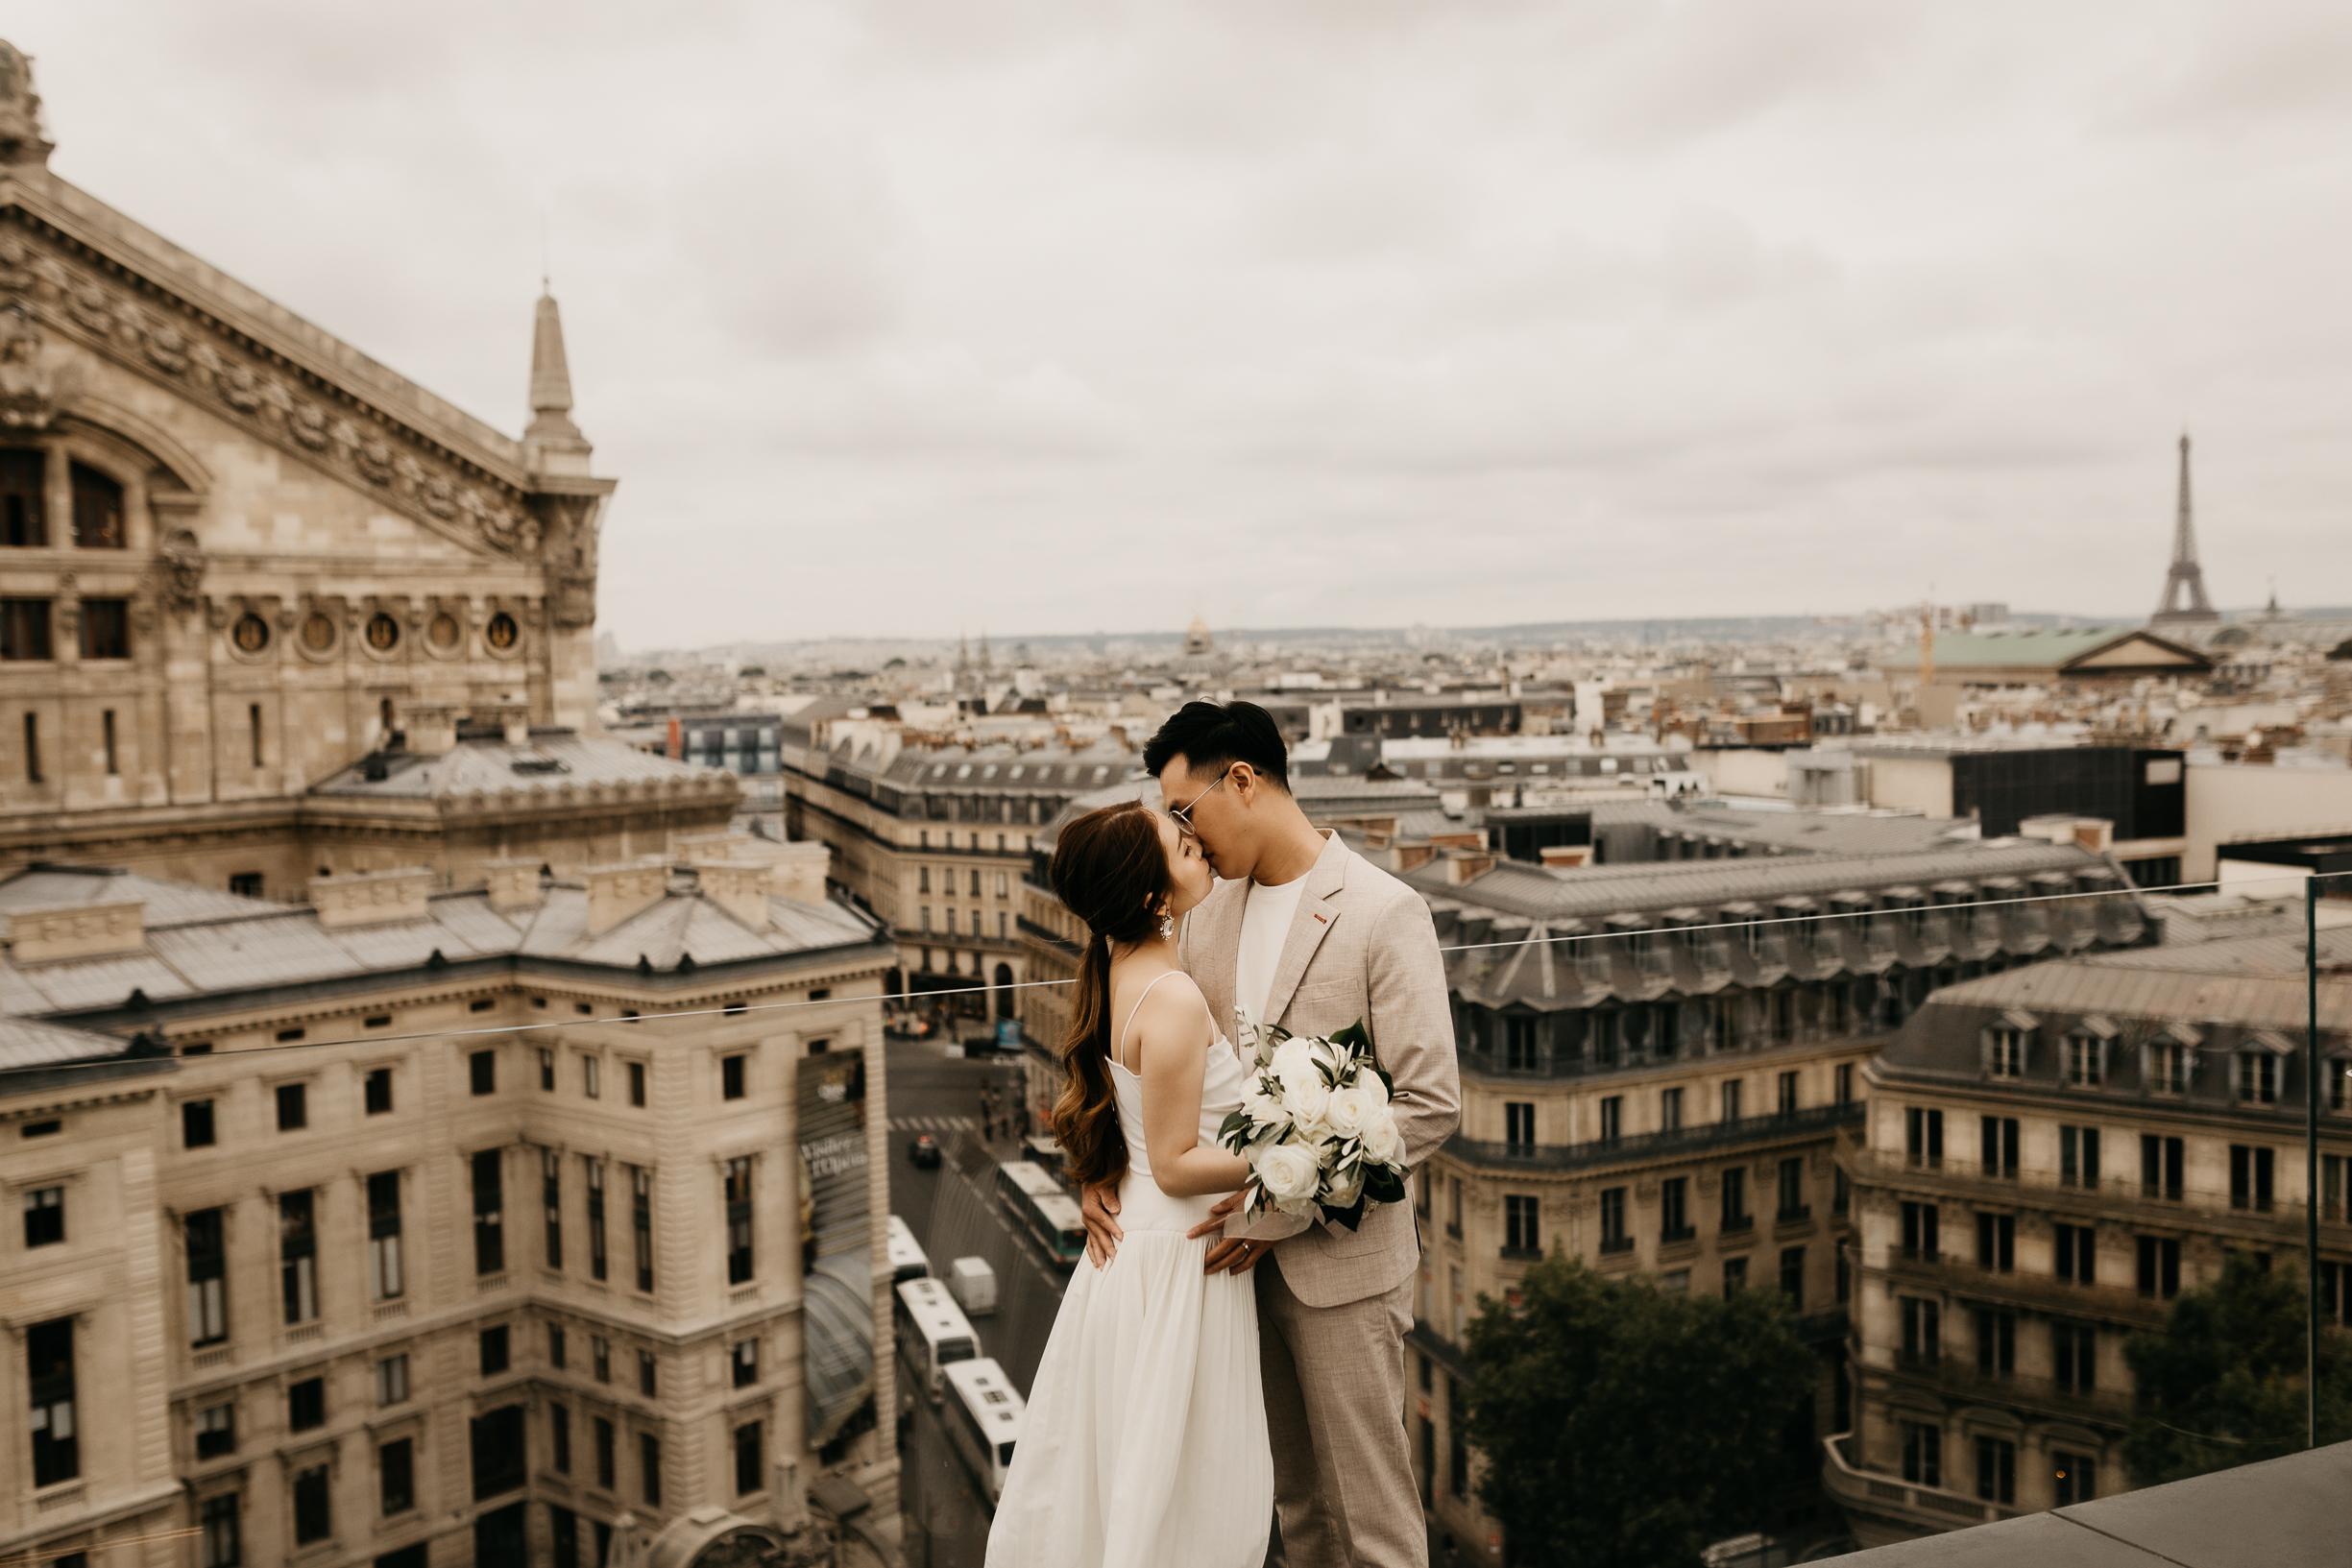 Paris rooftop couple engagement photography